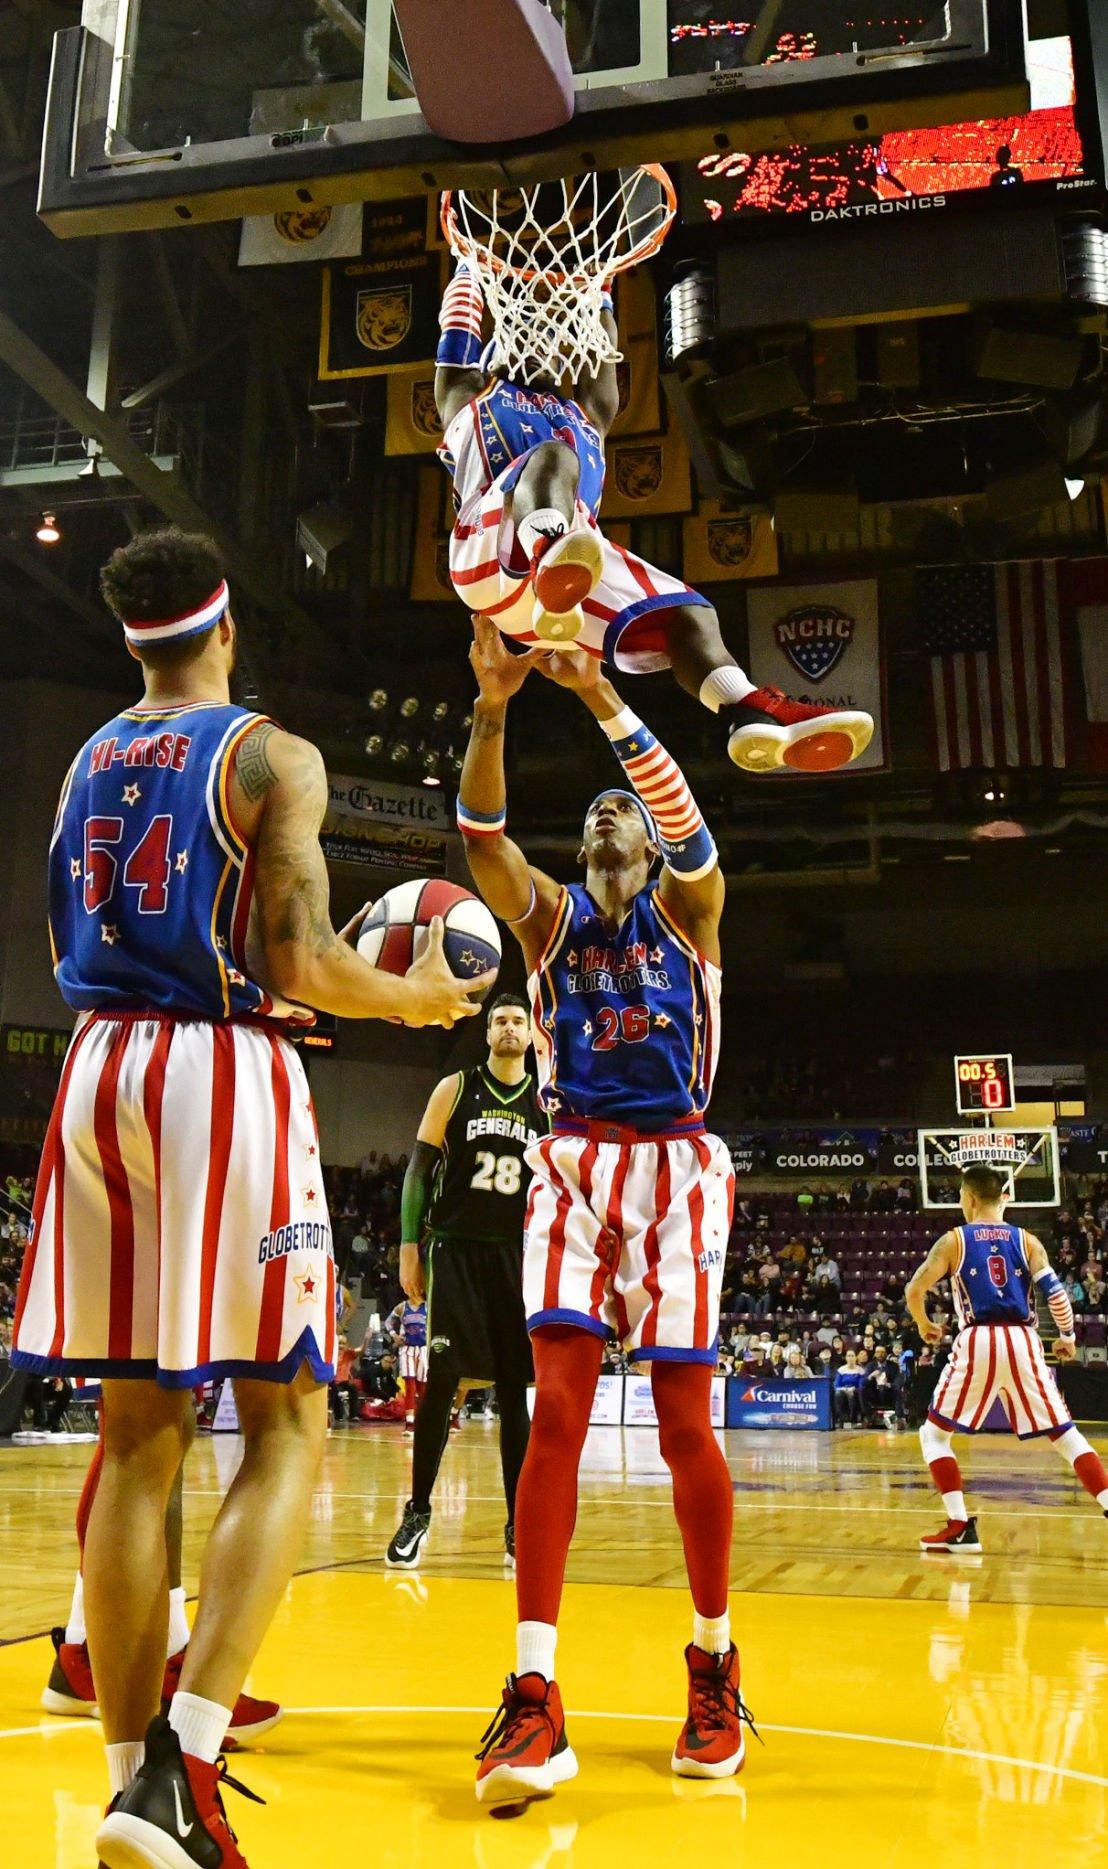 Harlem Globetrotters storm the World Arena (copy)